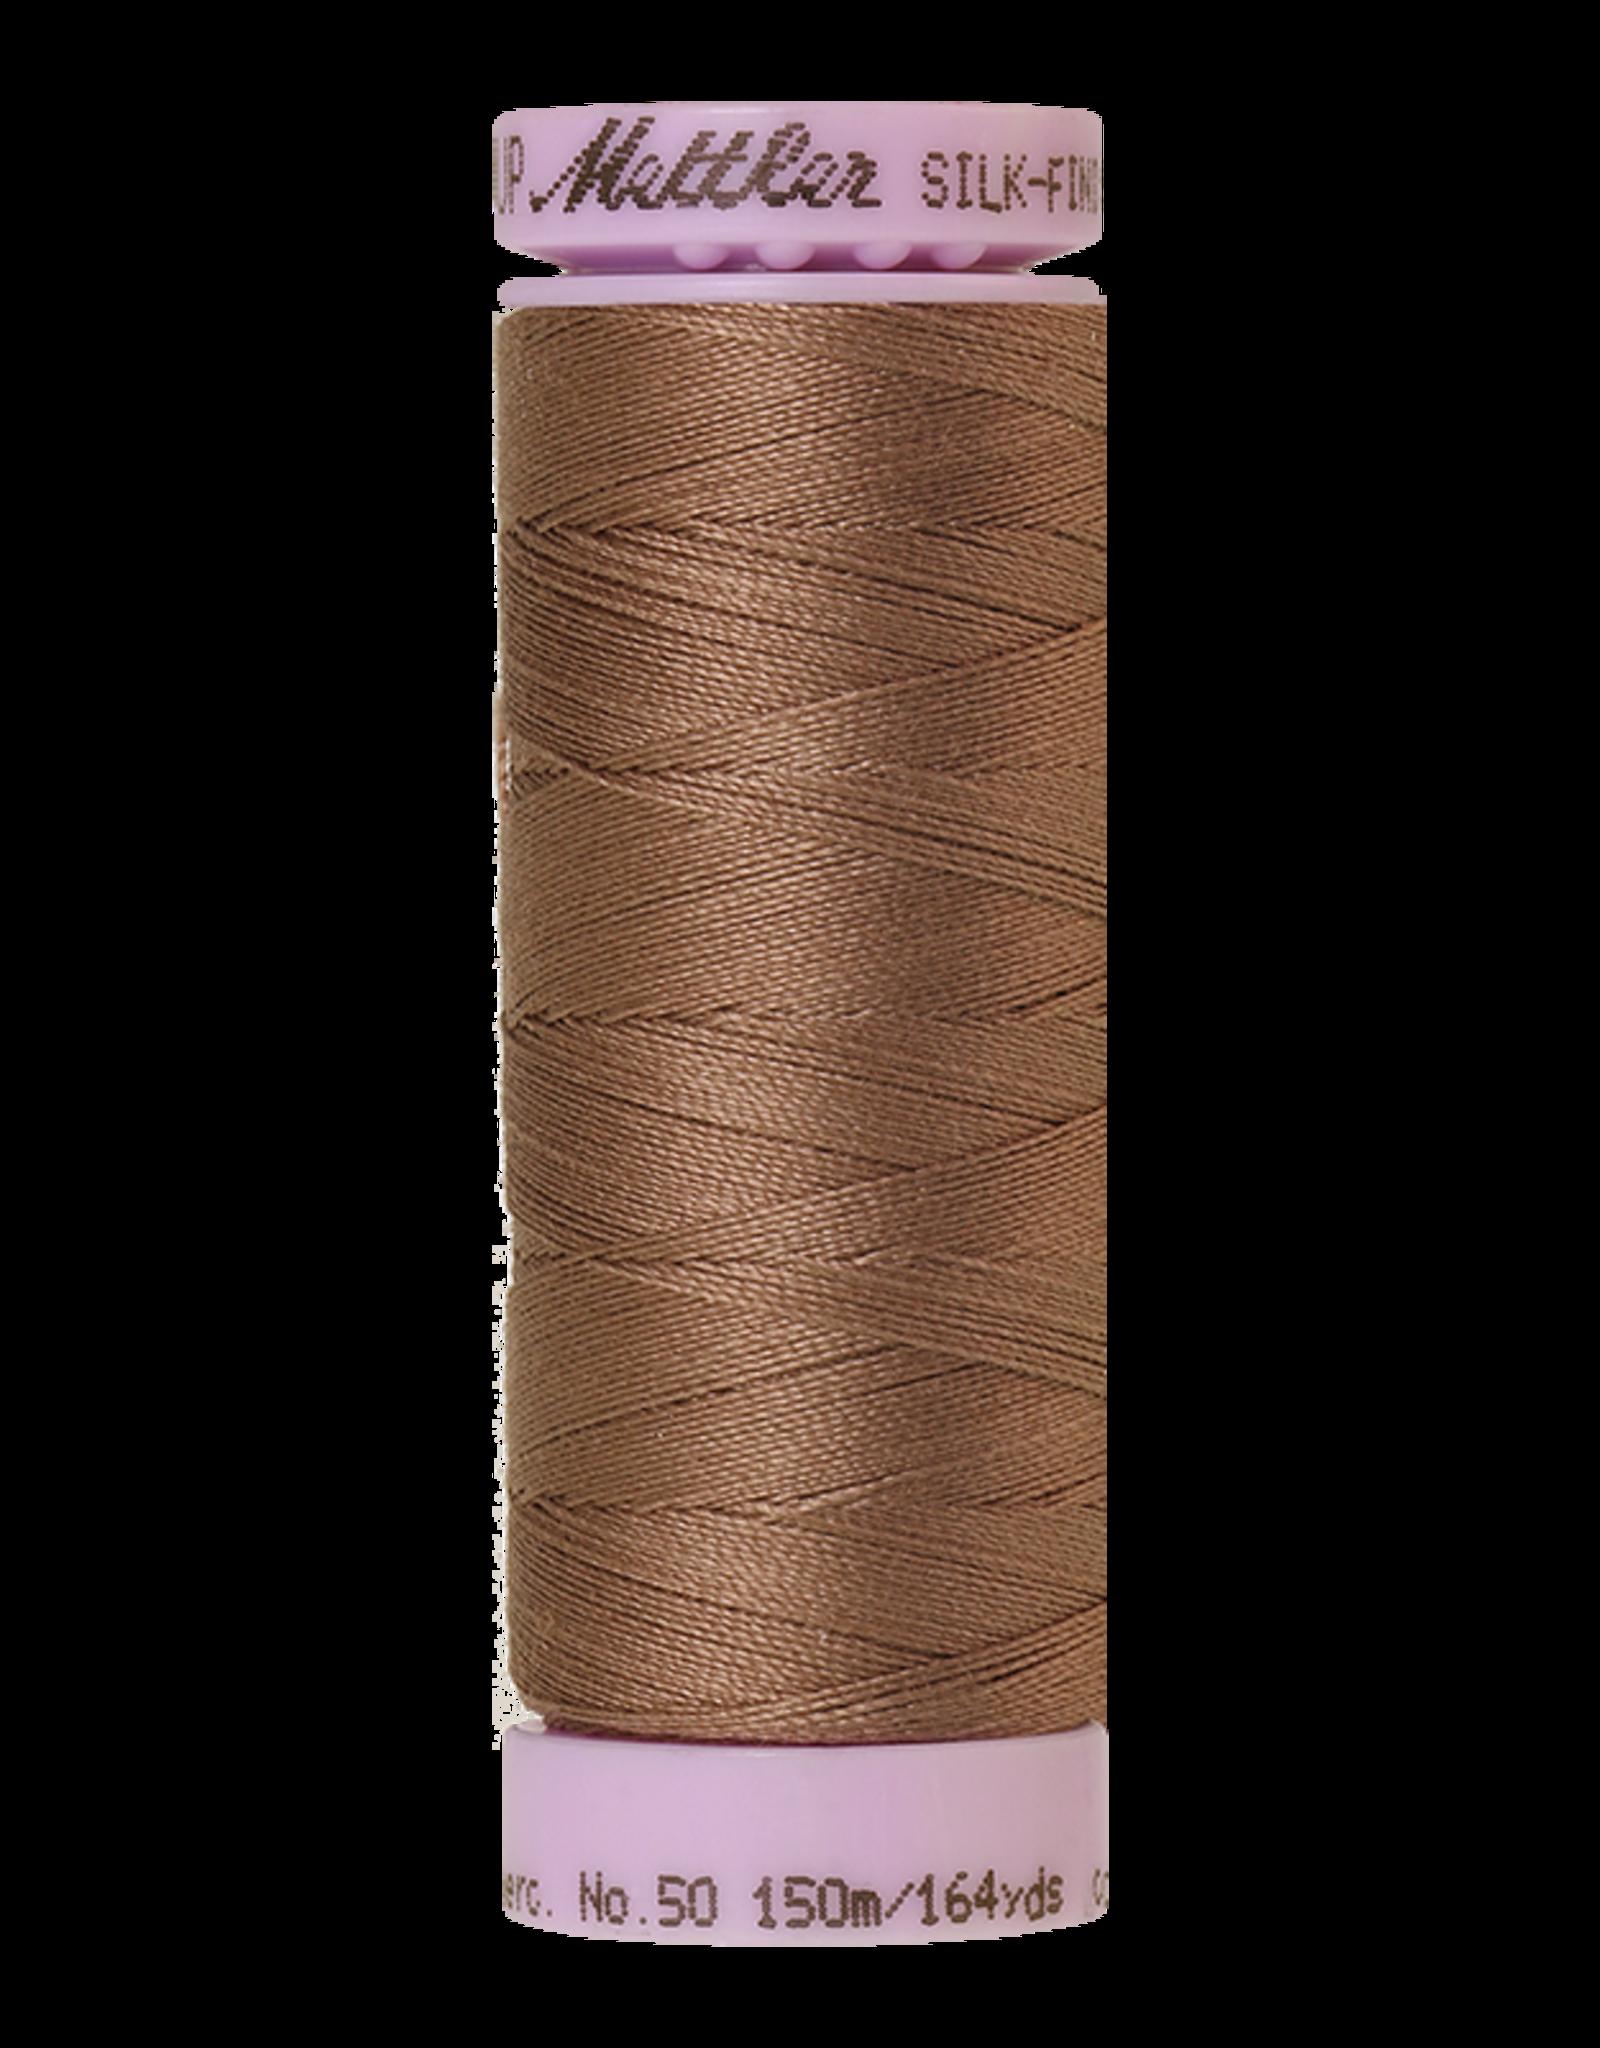 Mettler Silk Finish Cotton 50 - 150 meter - 1380